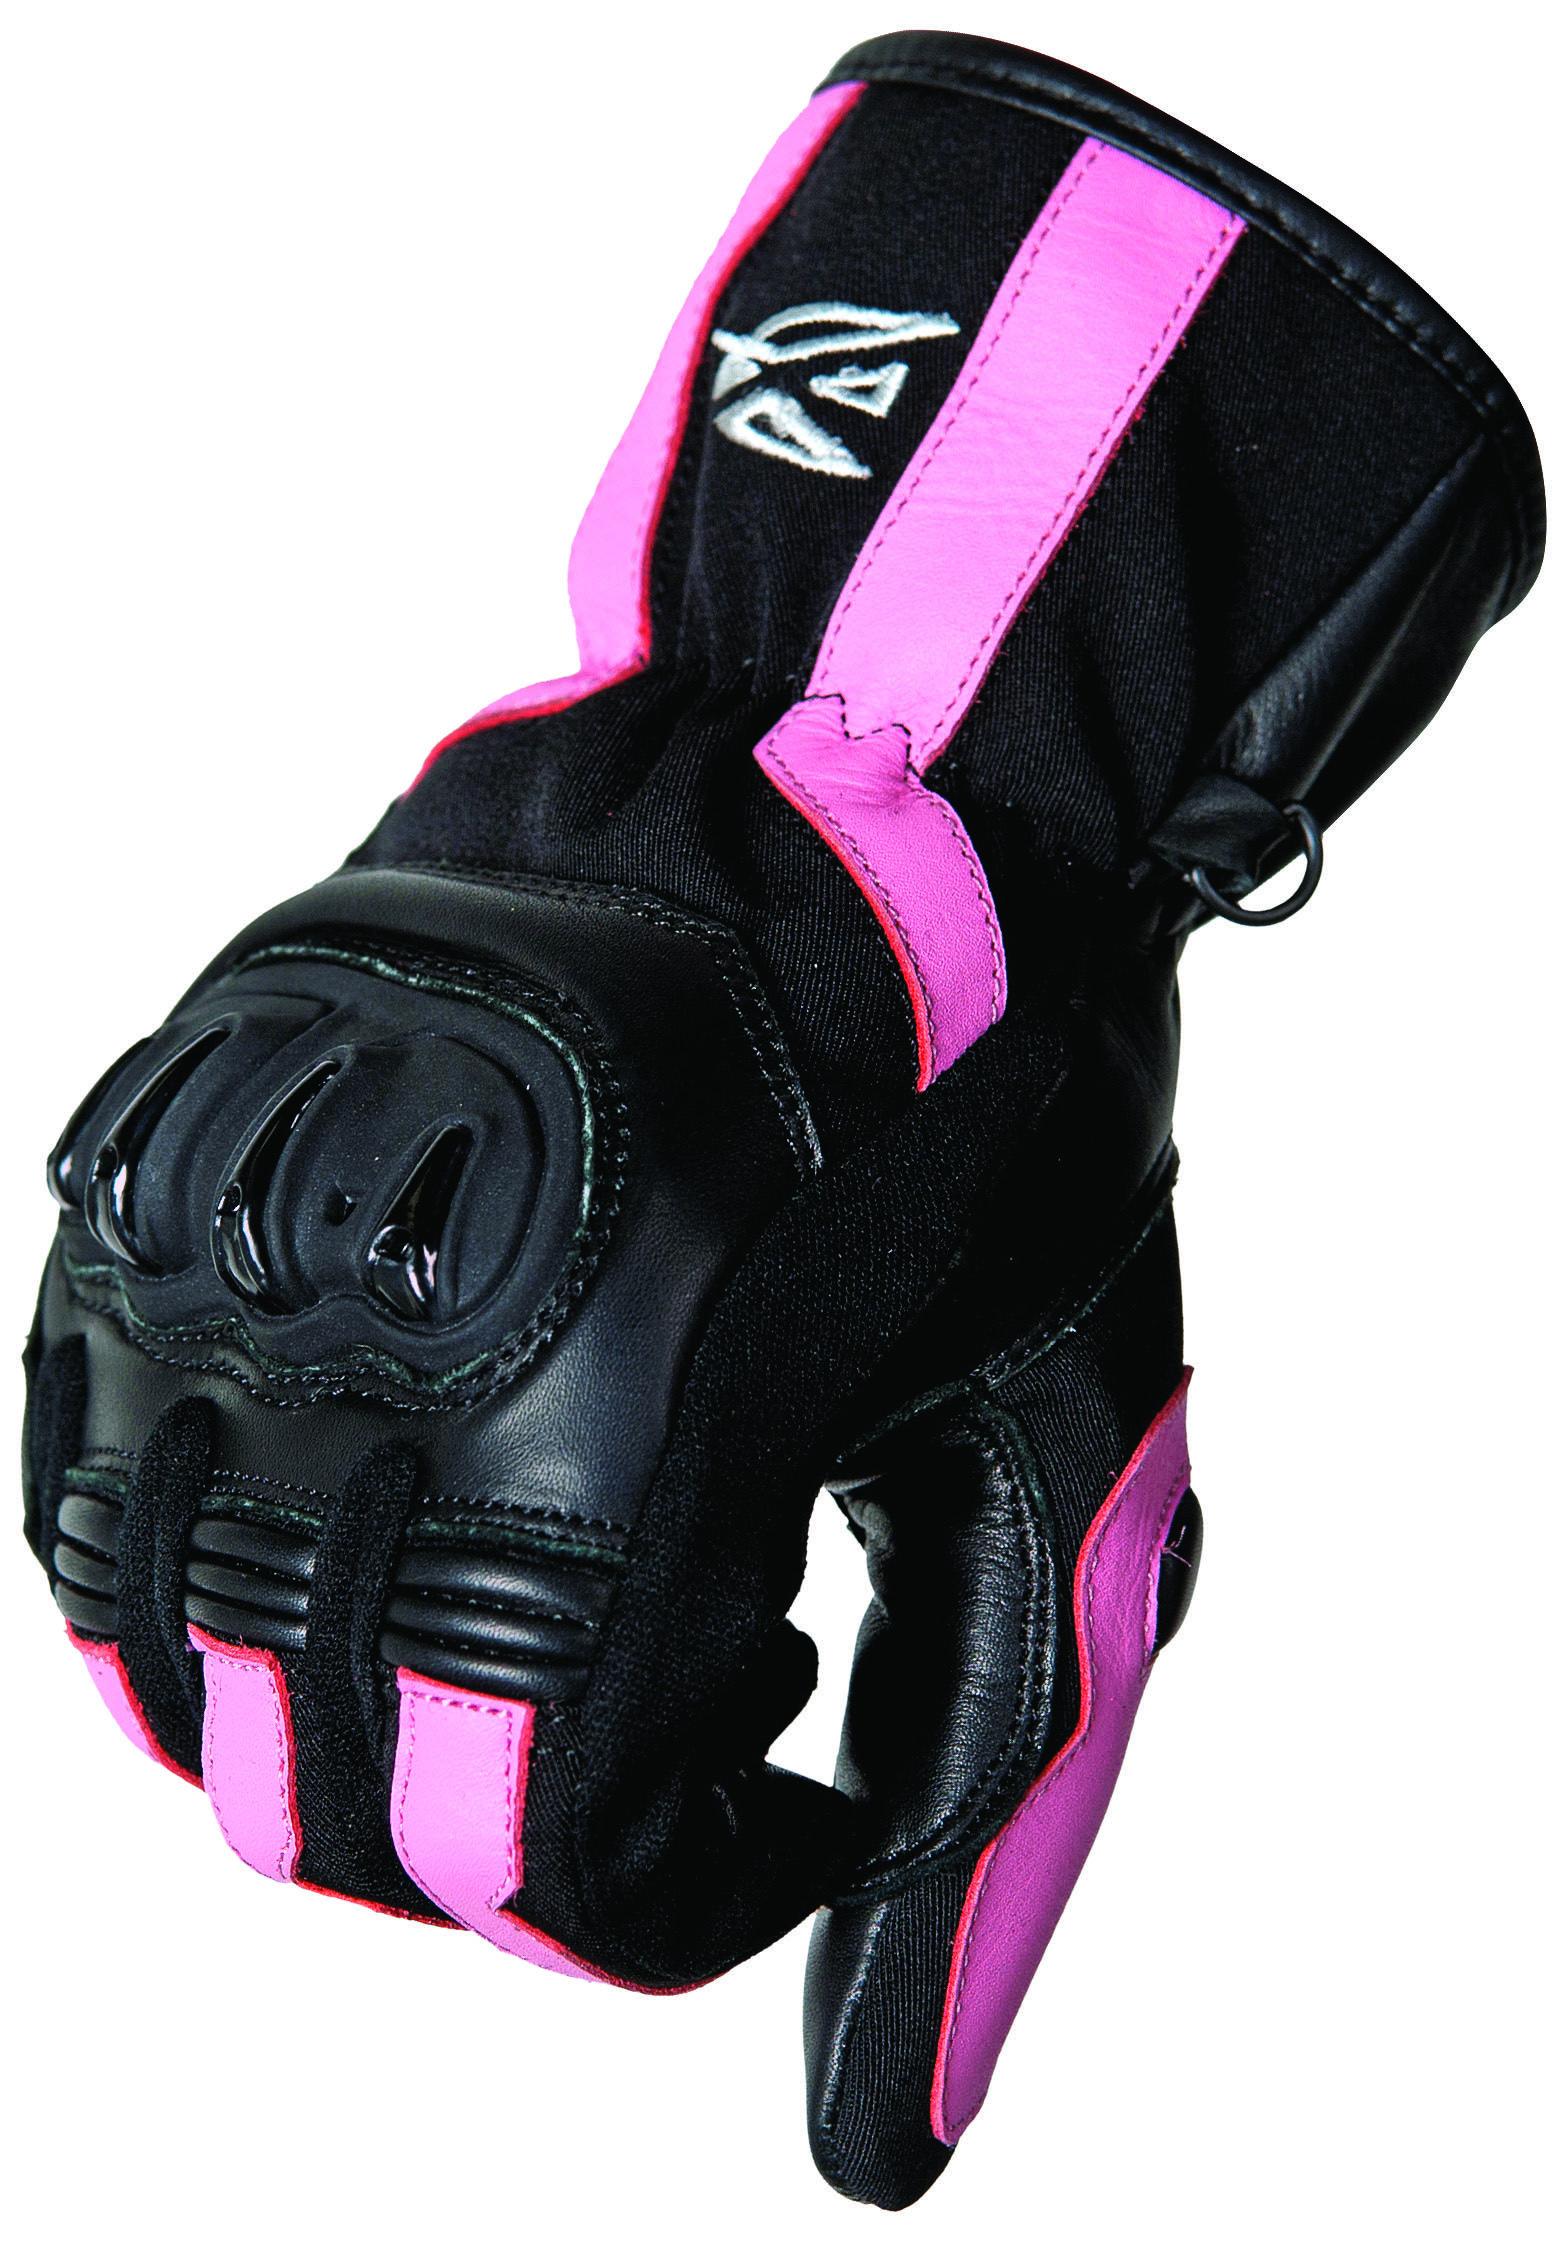 AGVSPORT Esprit Ladies Glove (Black, Pink) Mid length